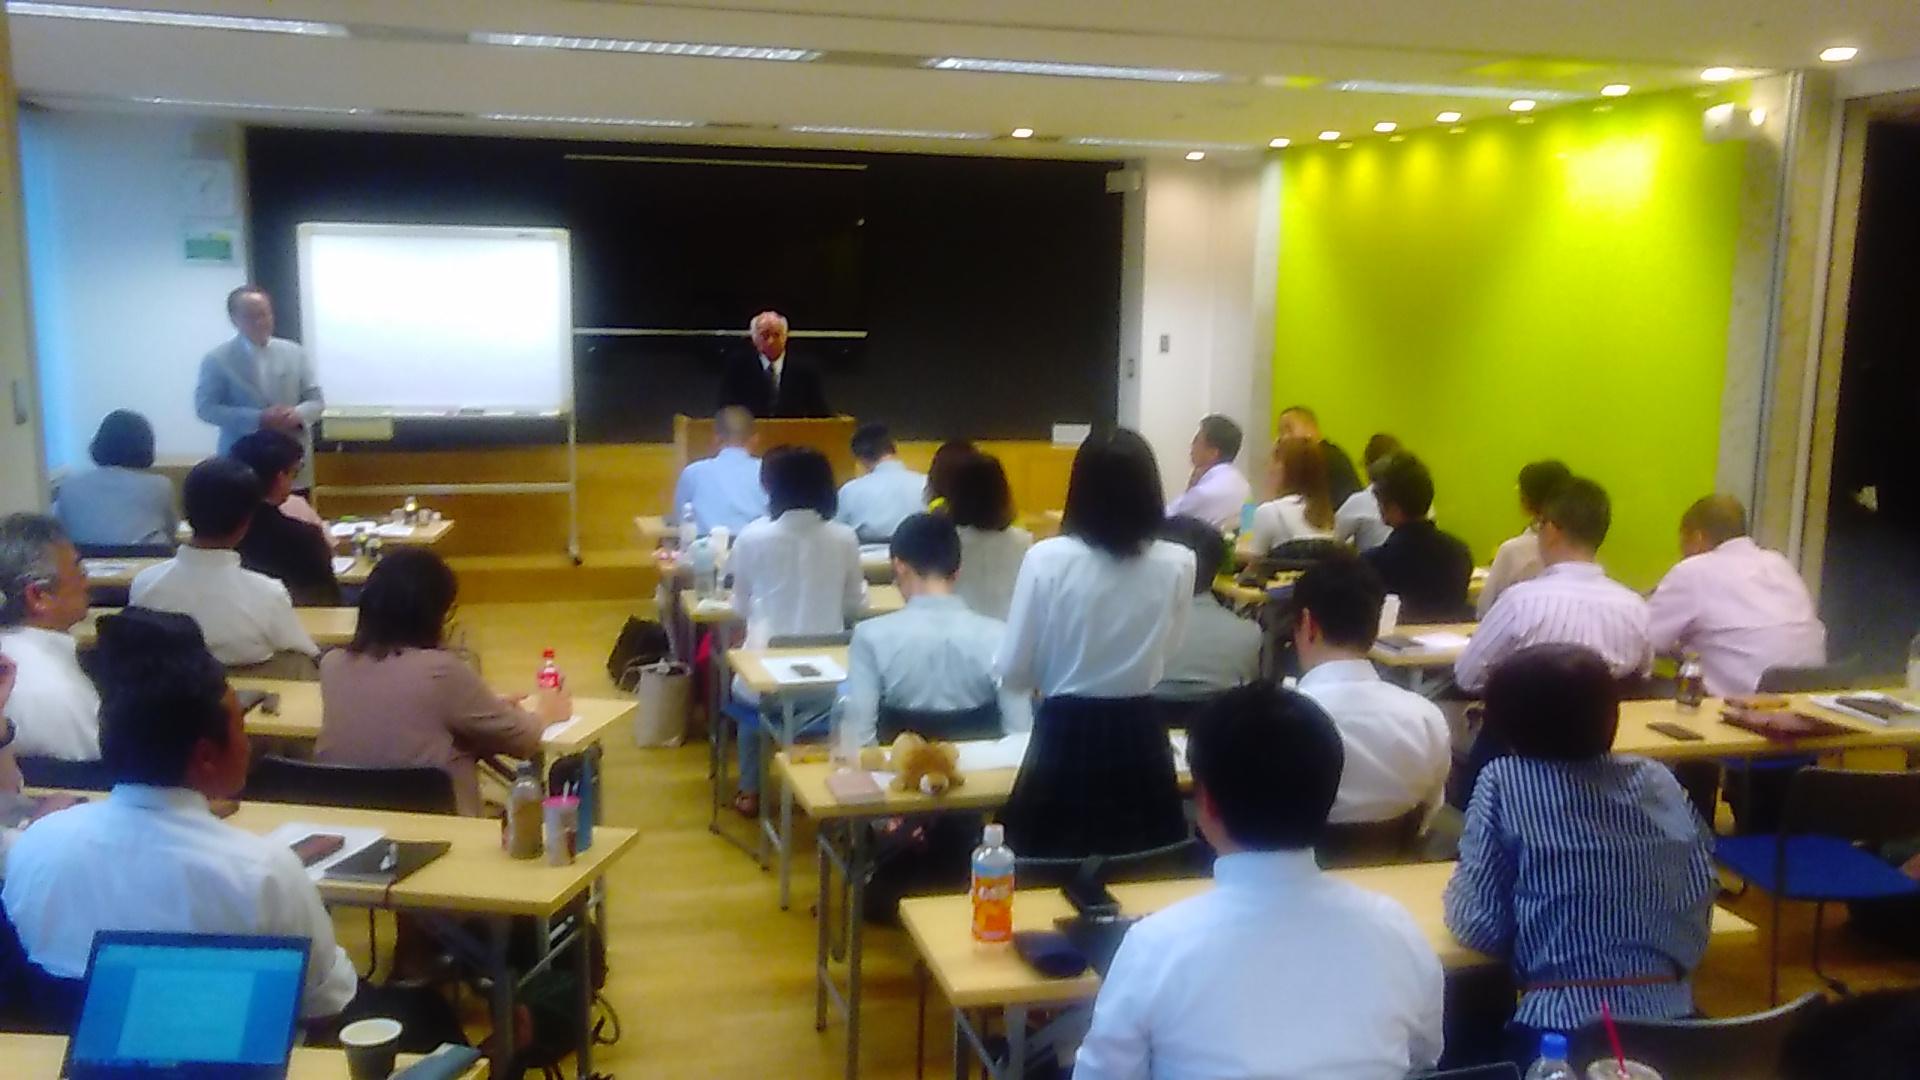 KIMG0762 - 思風会全国大会in広島